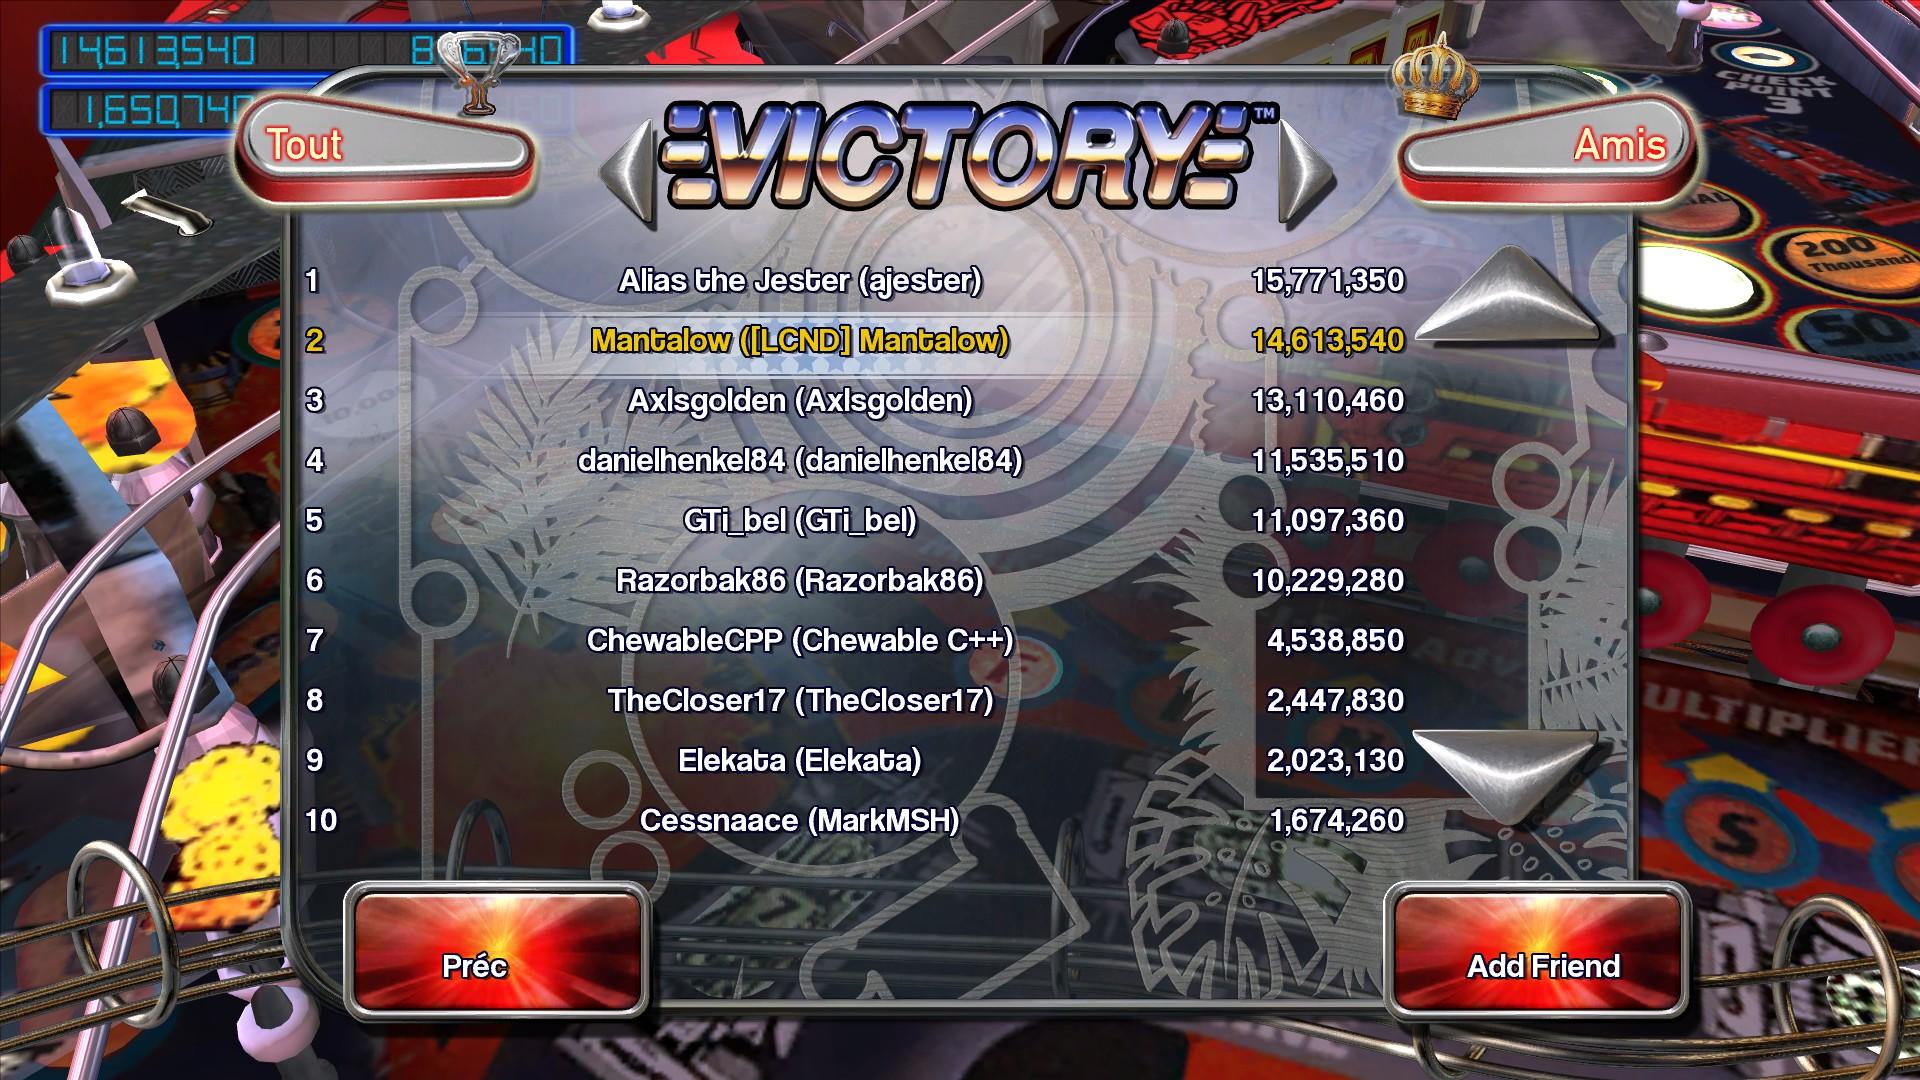 Mantalow: Pinball Arcade: Victory (PC) 14,613,540 points on 2015-07-01 15:31:03